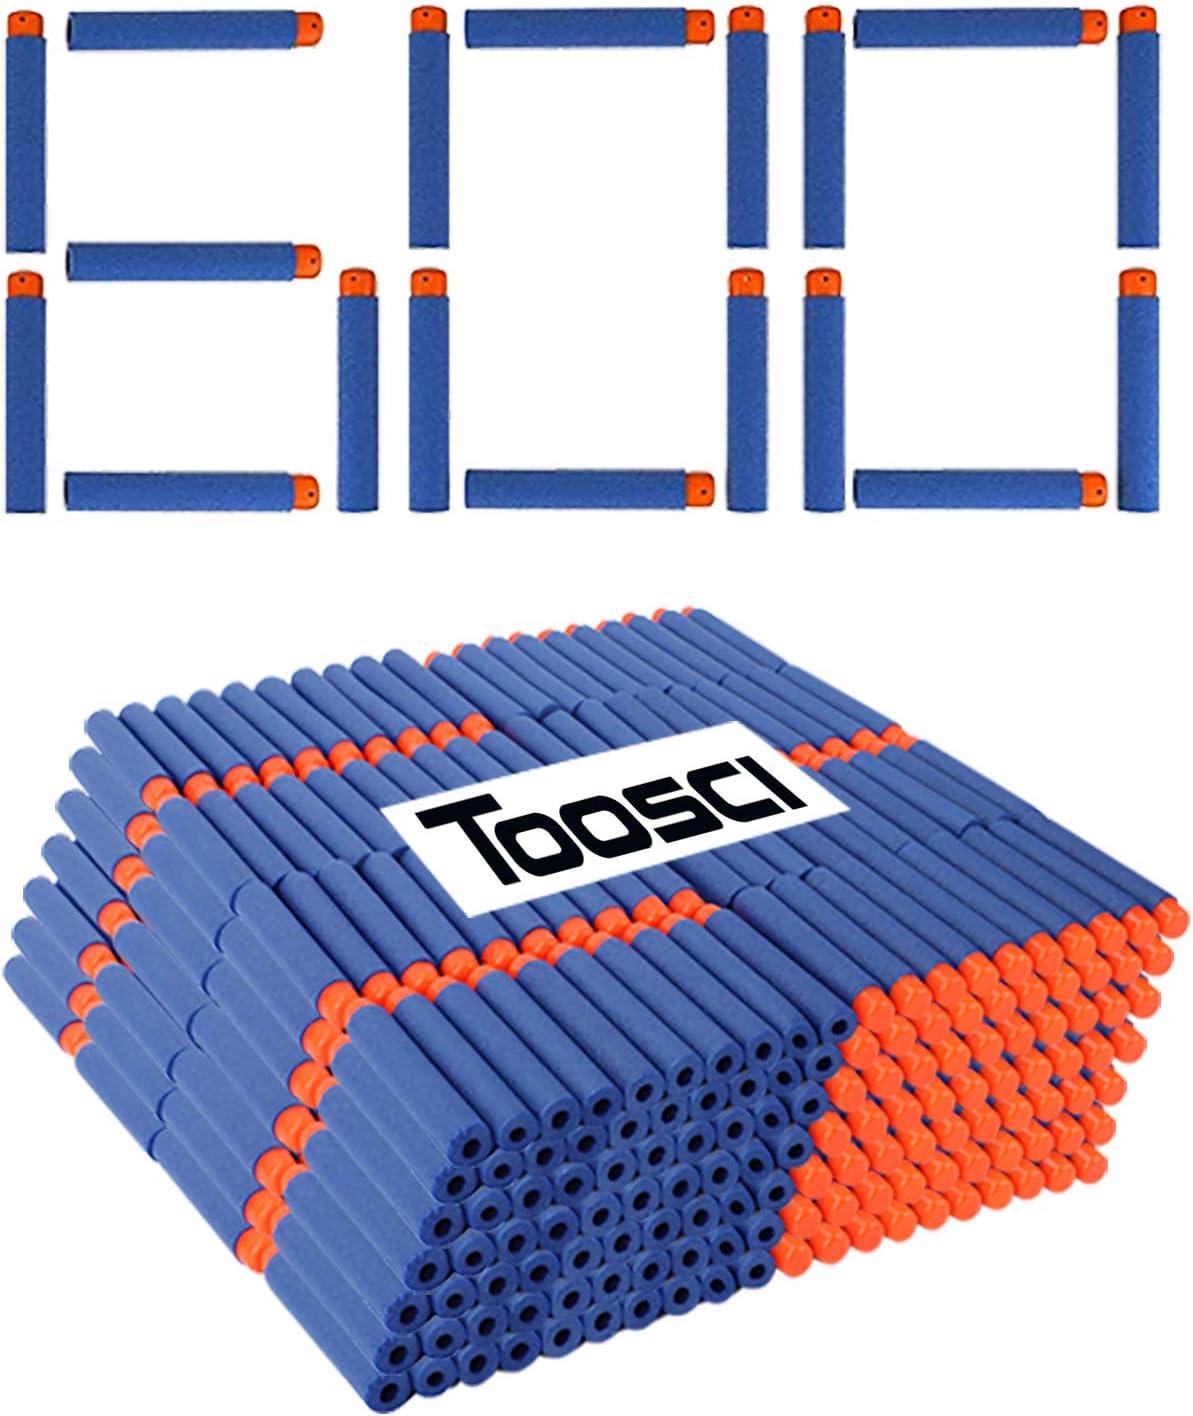 Toosci Nerf Refill Bullets Foam Darts 7.2cm Refill Pack Compatible for Nerf N-Strike Elite Series Blasters Kids Toy Gun Darts 600 Pack Blue